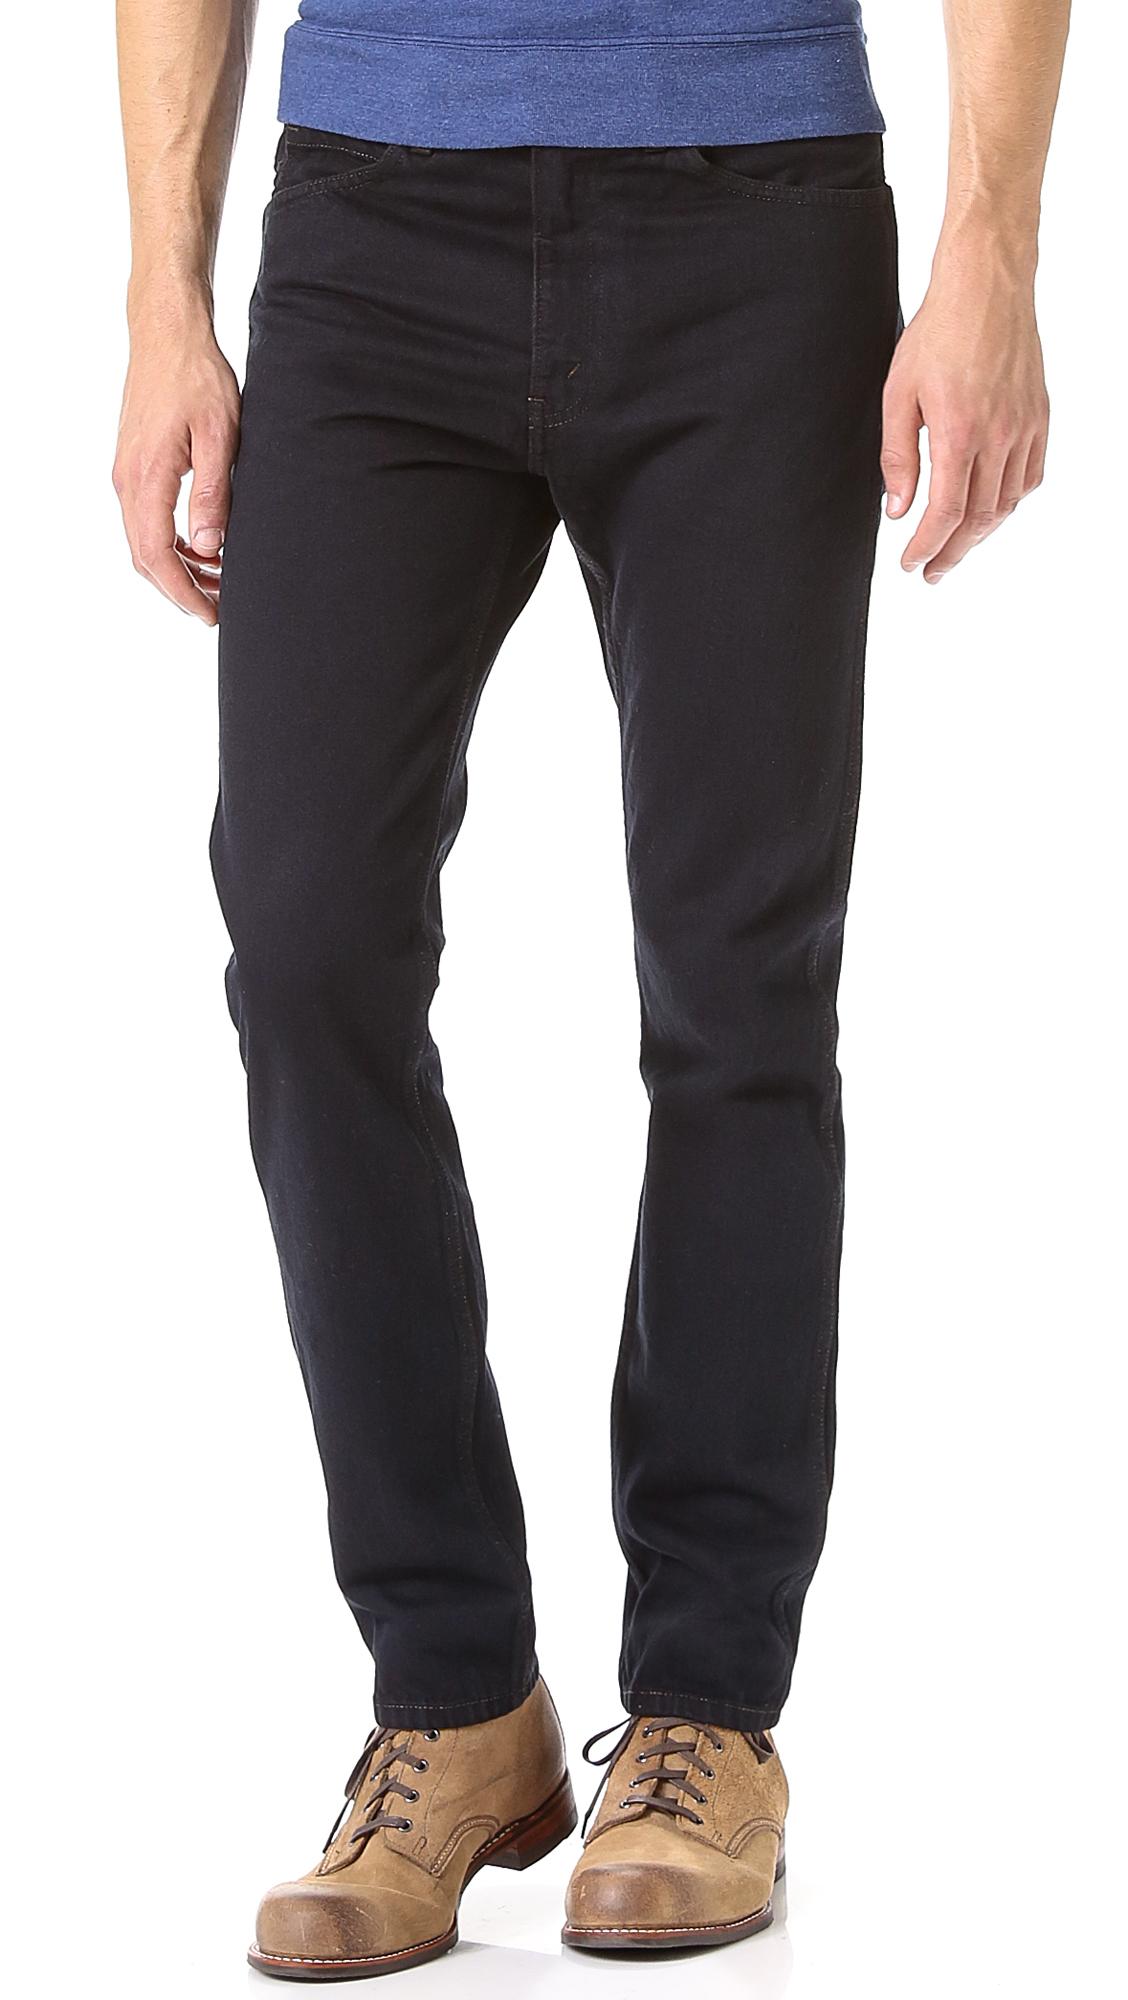 Levi's Black Overdye 1960s 606 Jeans | EAST DANE